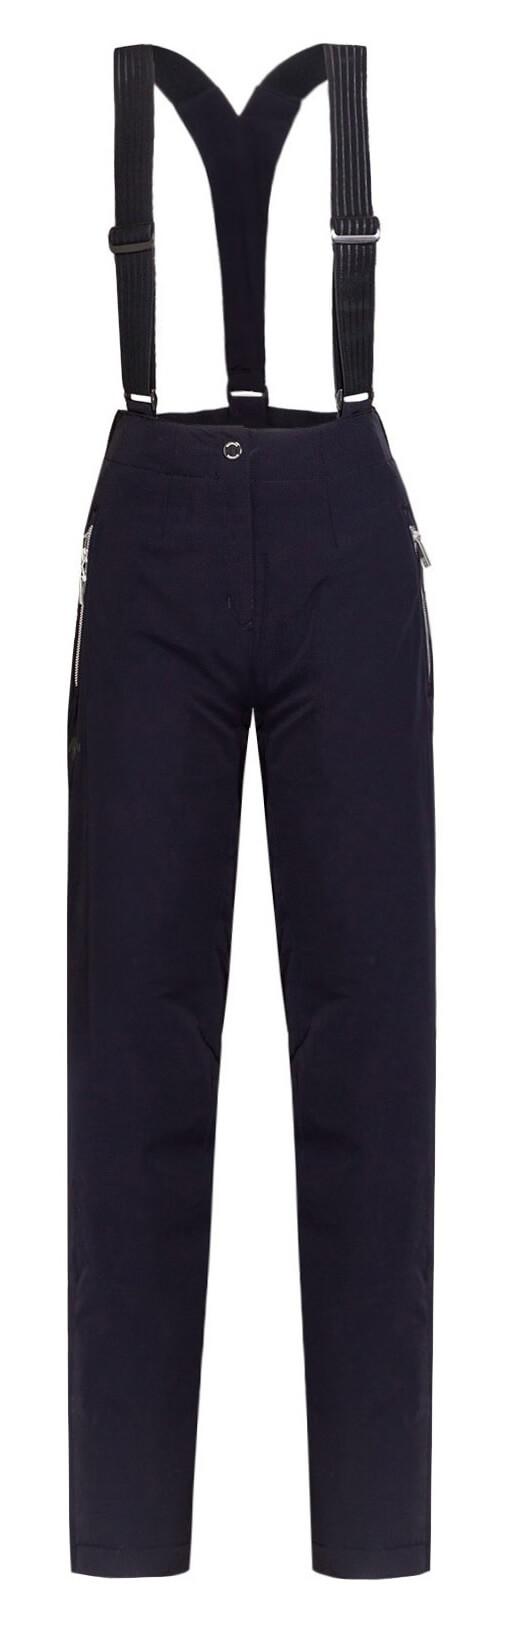 Женские брюки Descente Harriet (стандарт) - фото 3